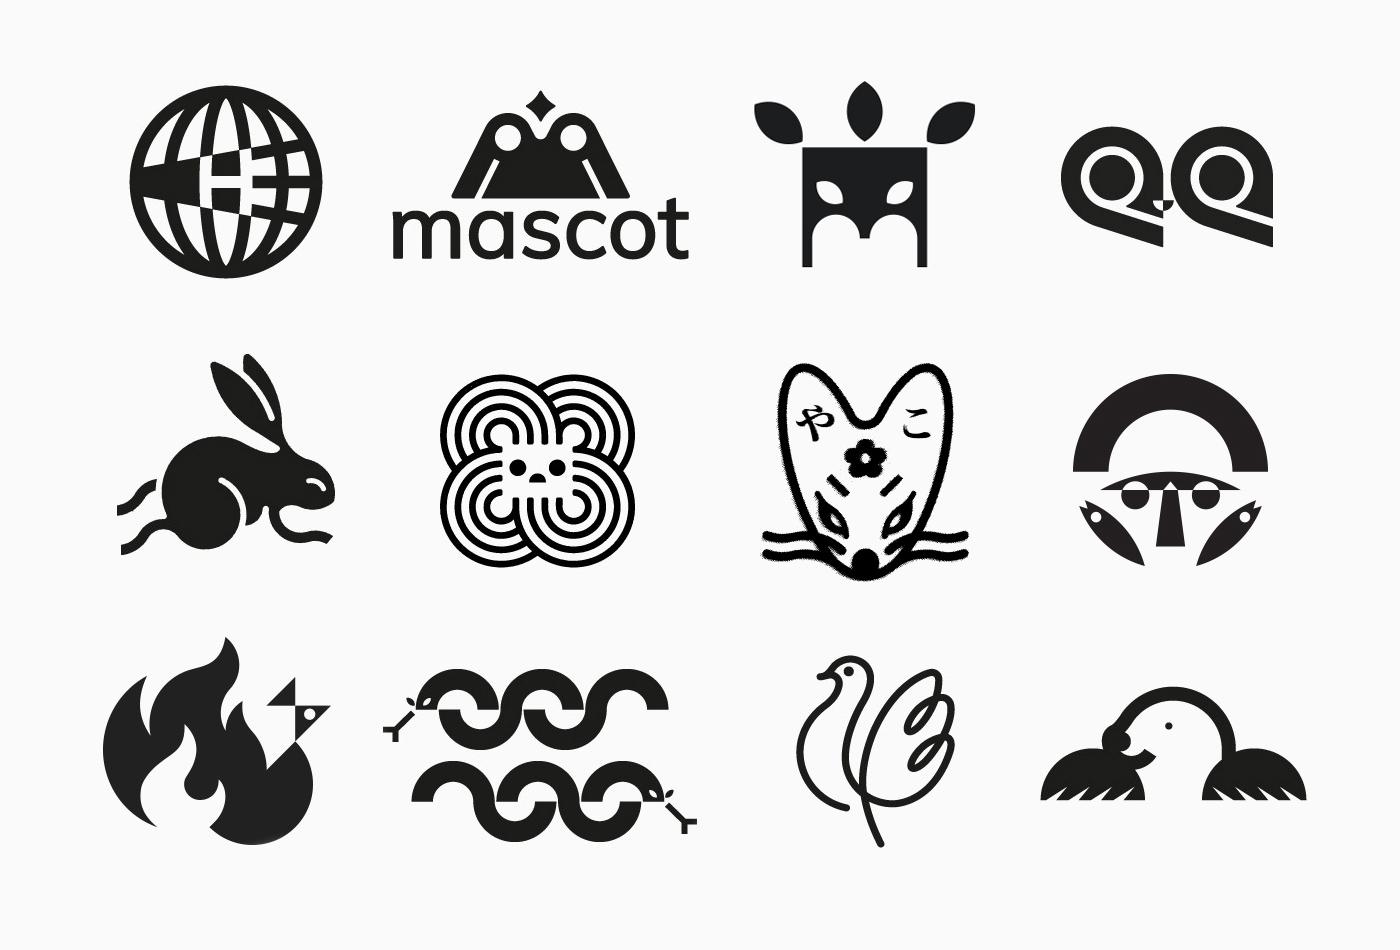 vacaliebres-logos-logo-marks-logotype-picto-icon-icons-branding-logolounge-brand-symbol-logosinspirations